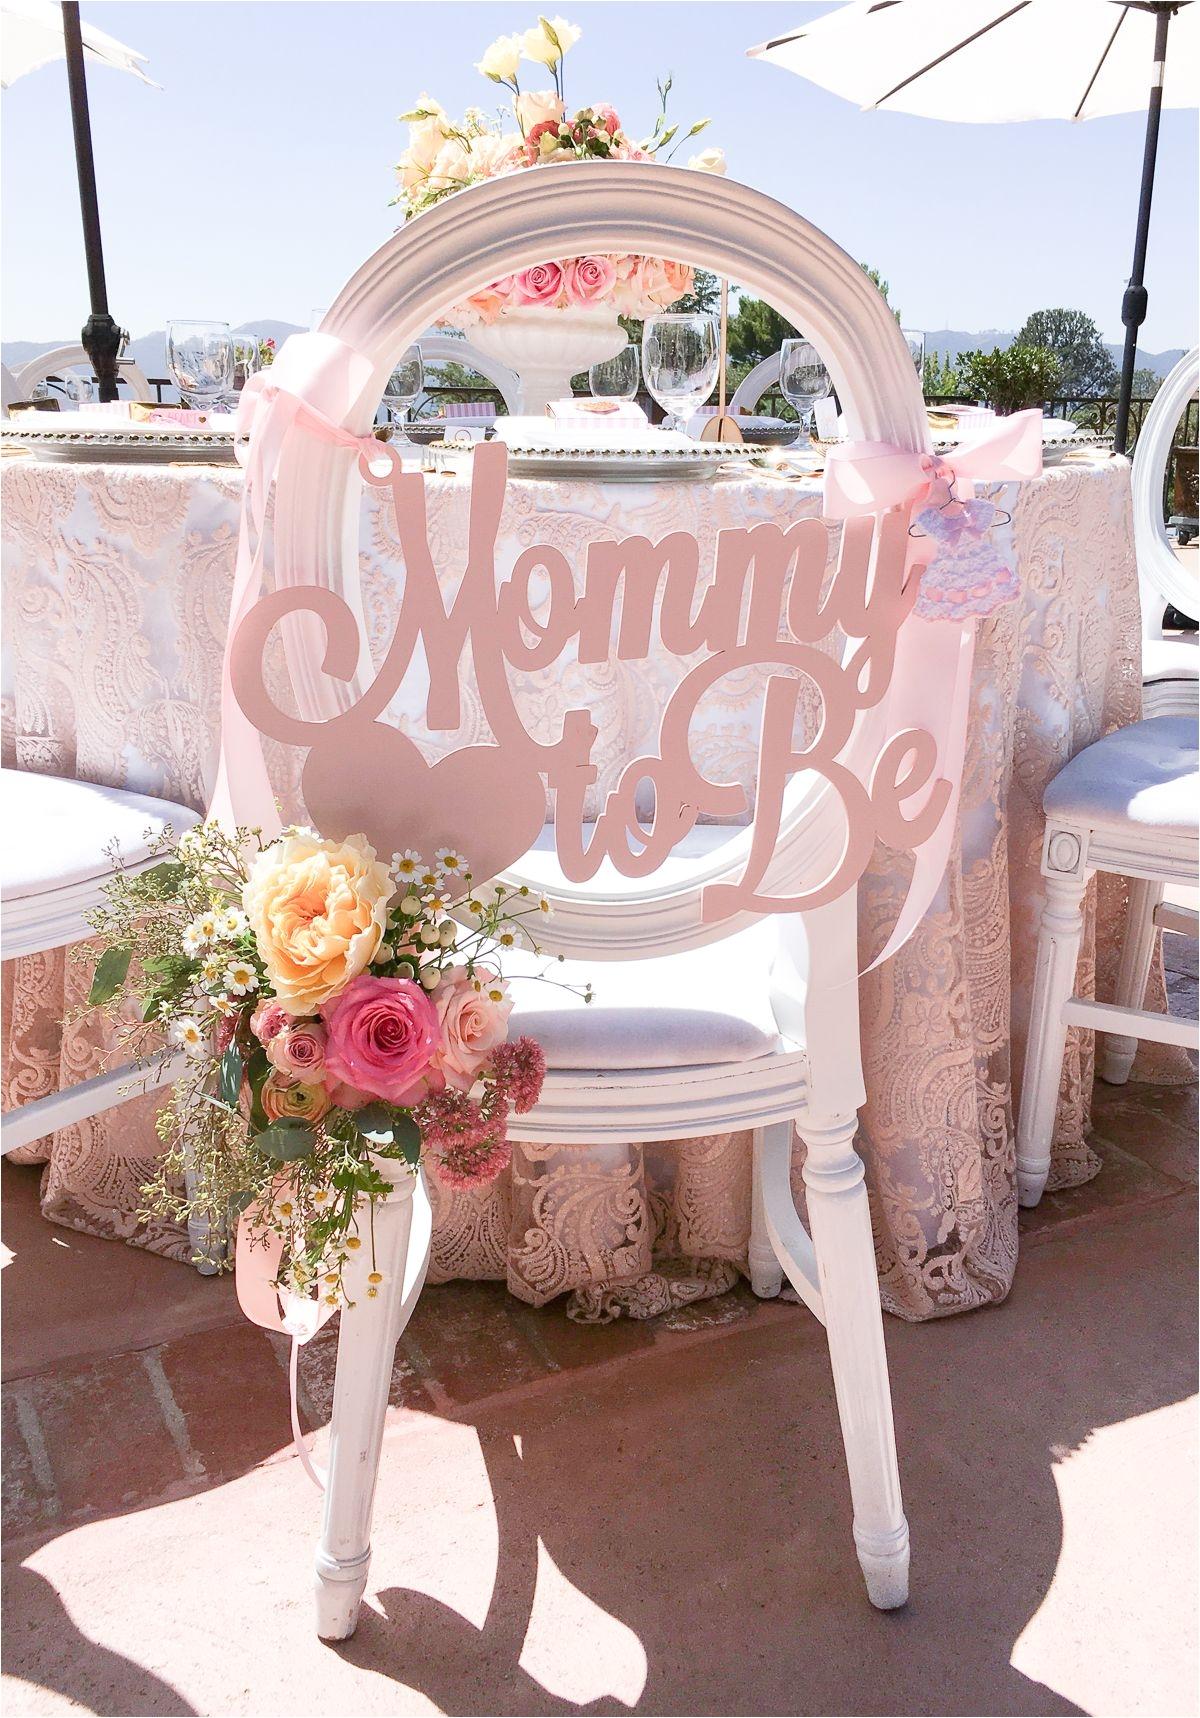 Royal Baby Shower Chair Rental Bradshomefurnishings